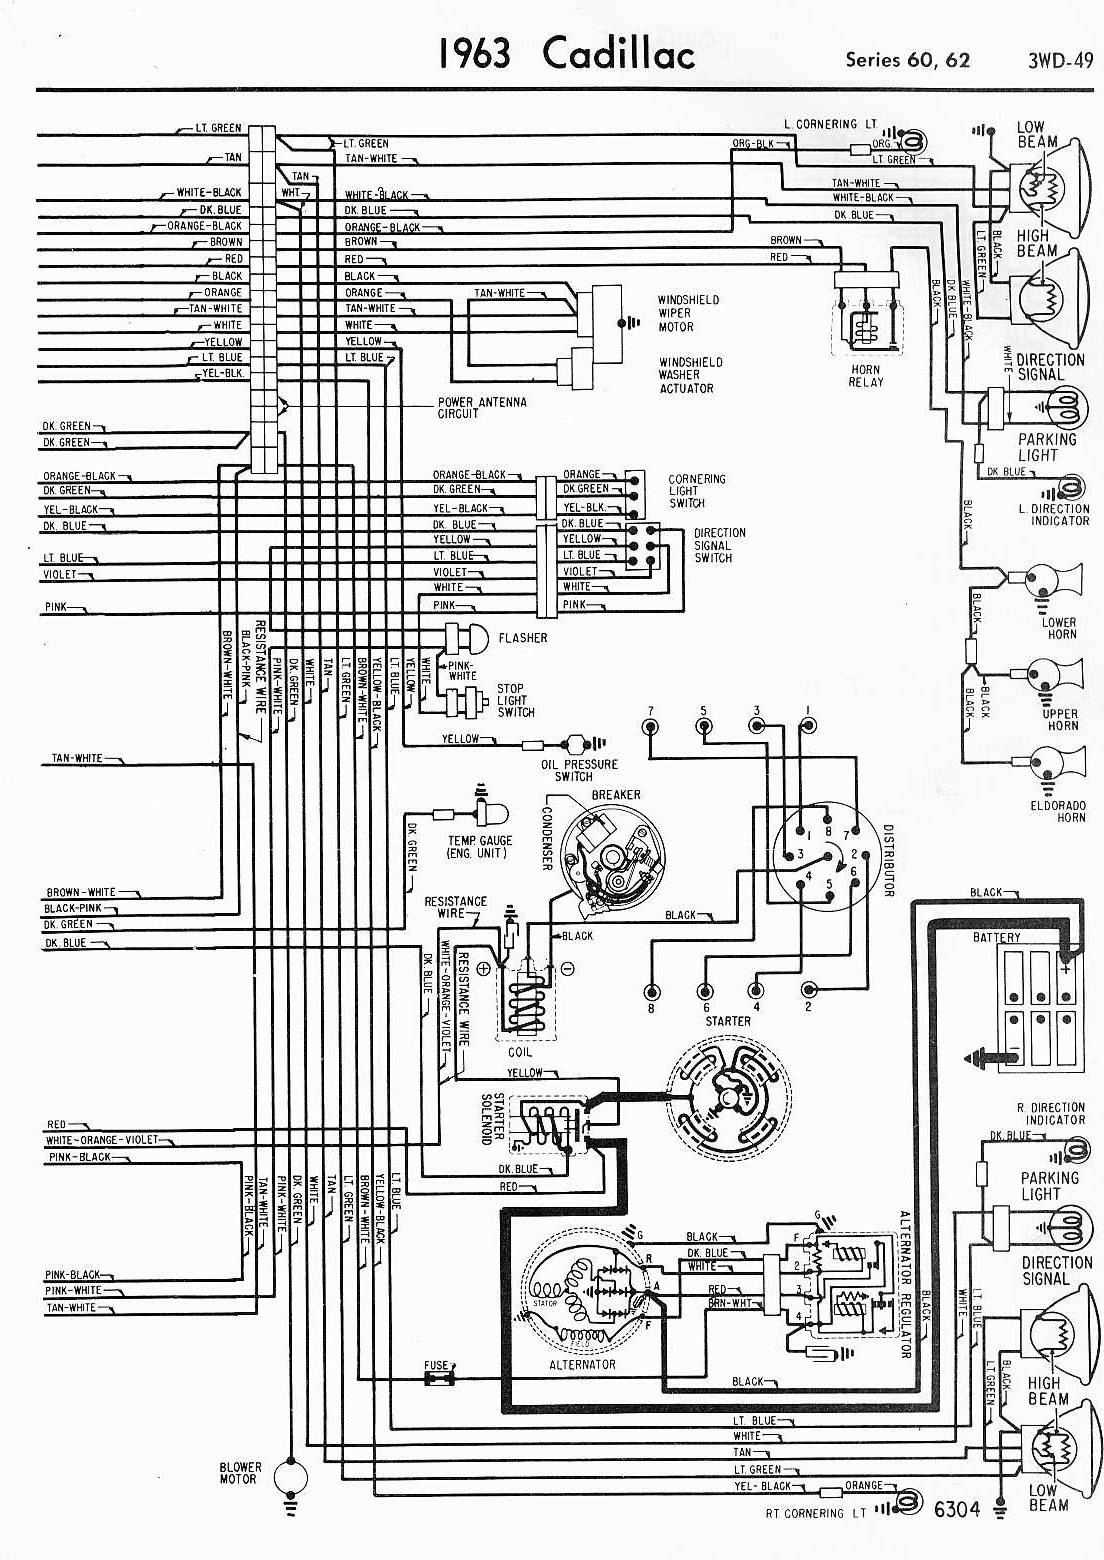 1982 cadillac wiring diagram wiring info u2022 rh cardsbox co Truck Wiring Harness Automotive Wiring Harness